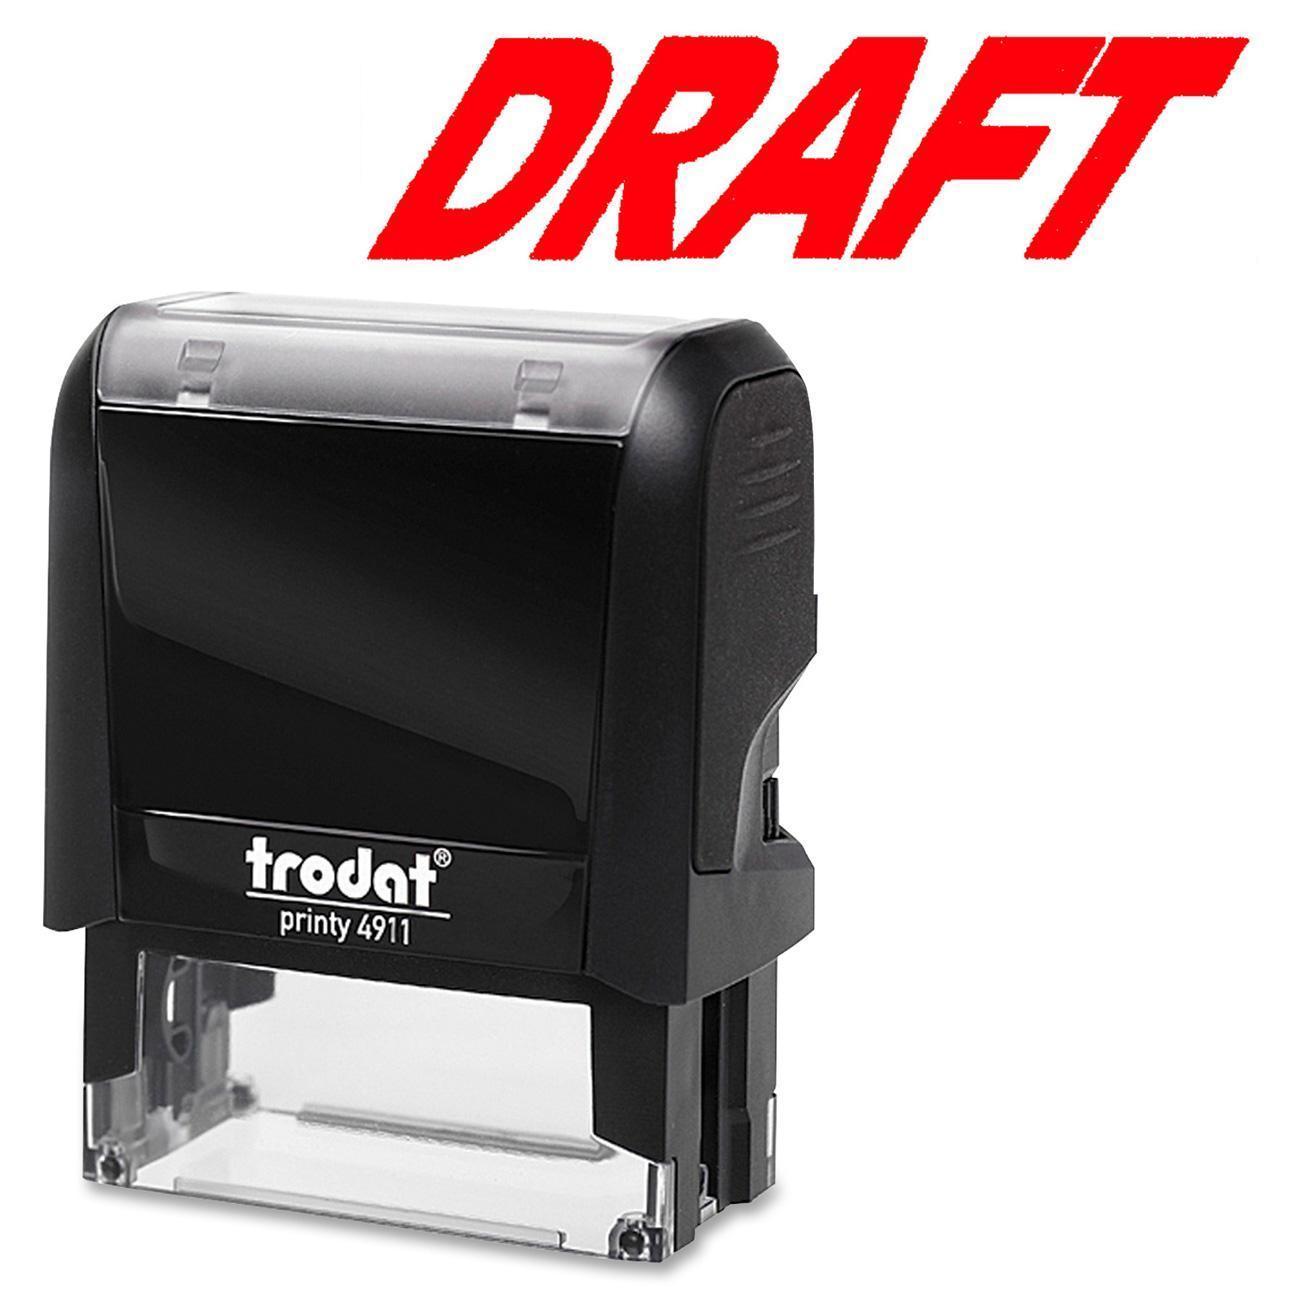 "Trodat Self Inking Stamp ""Draft"" - Each"